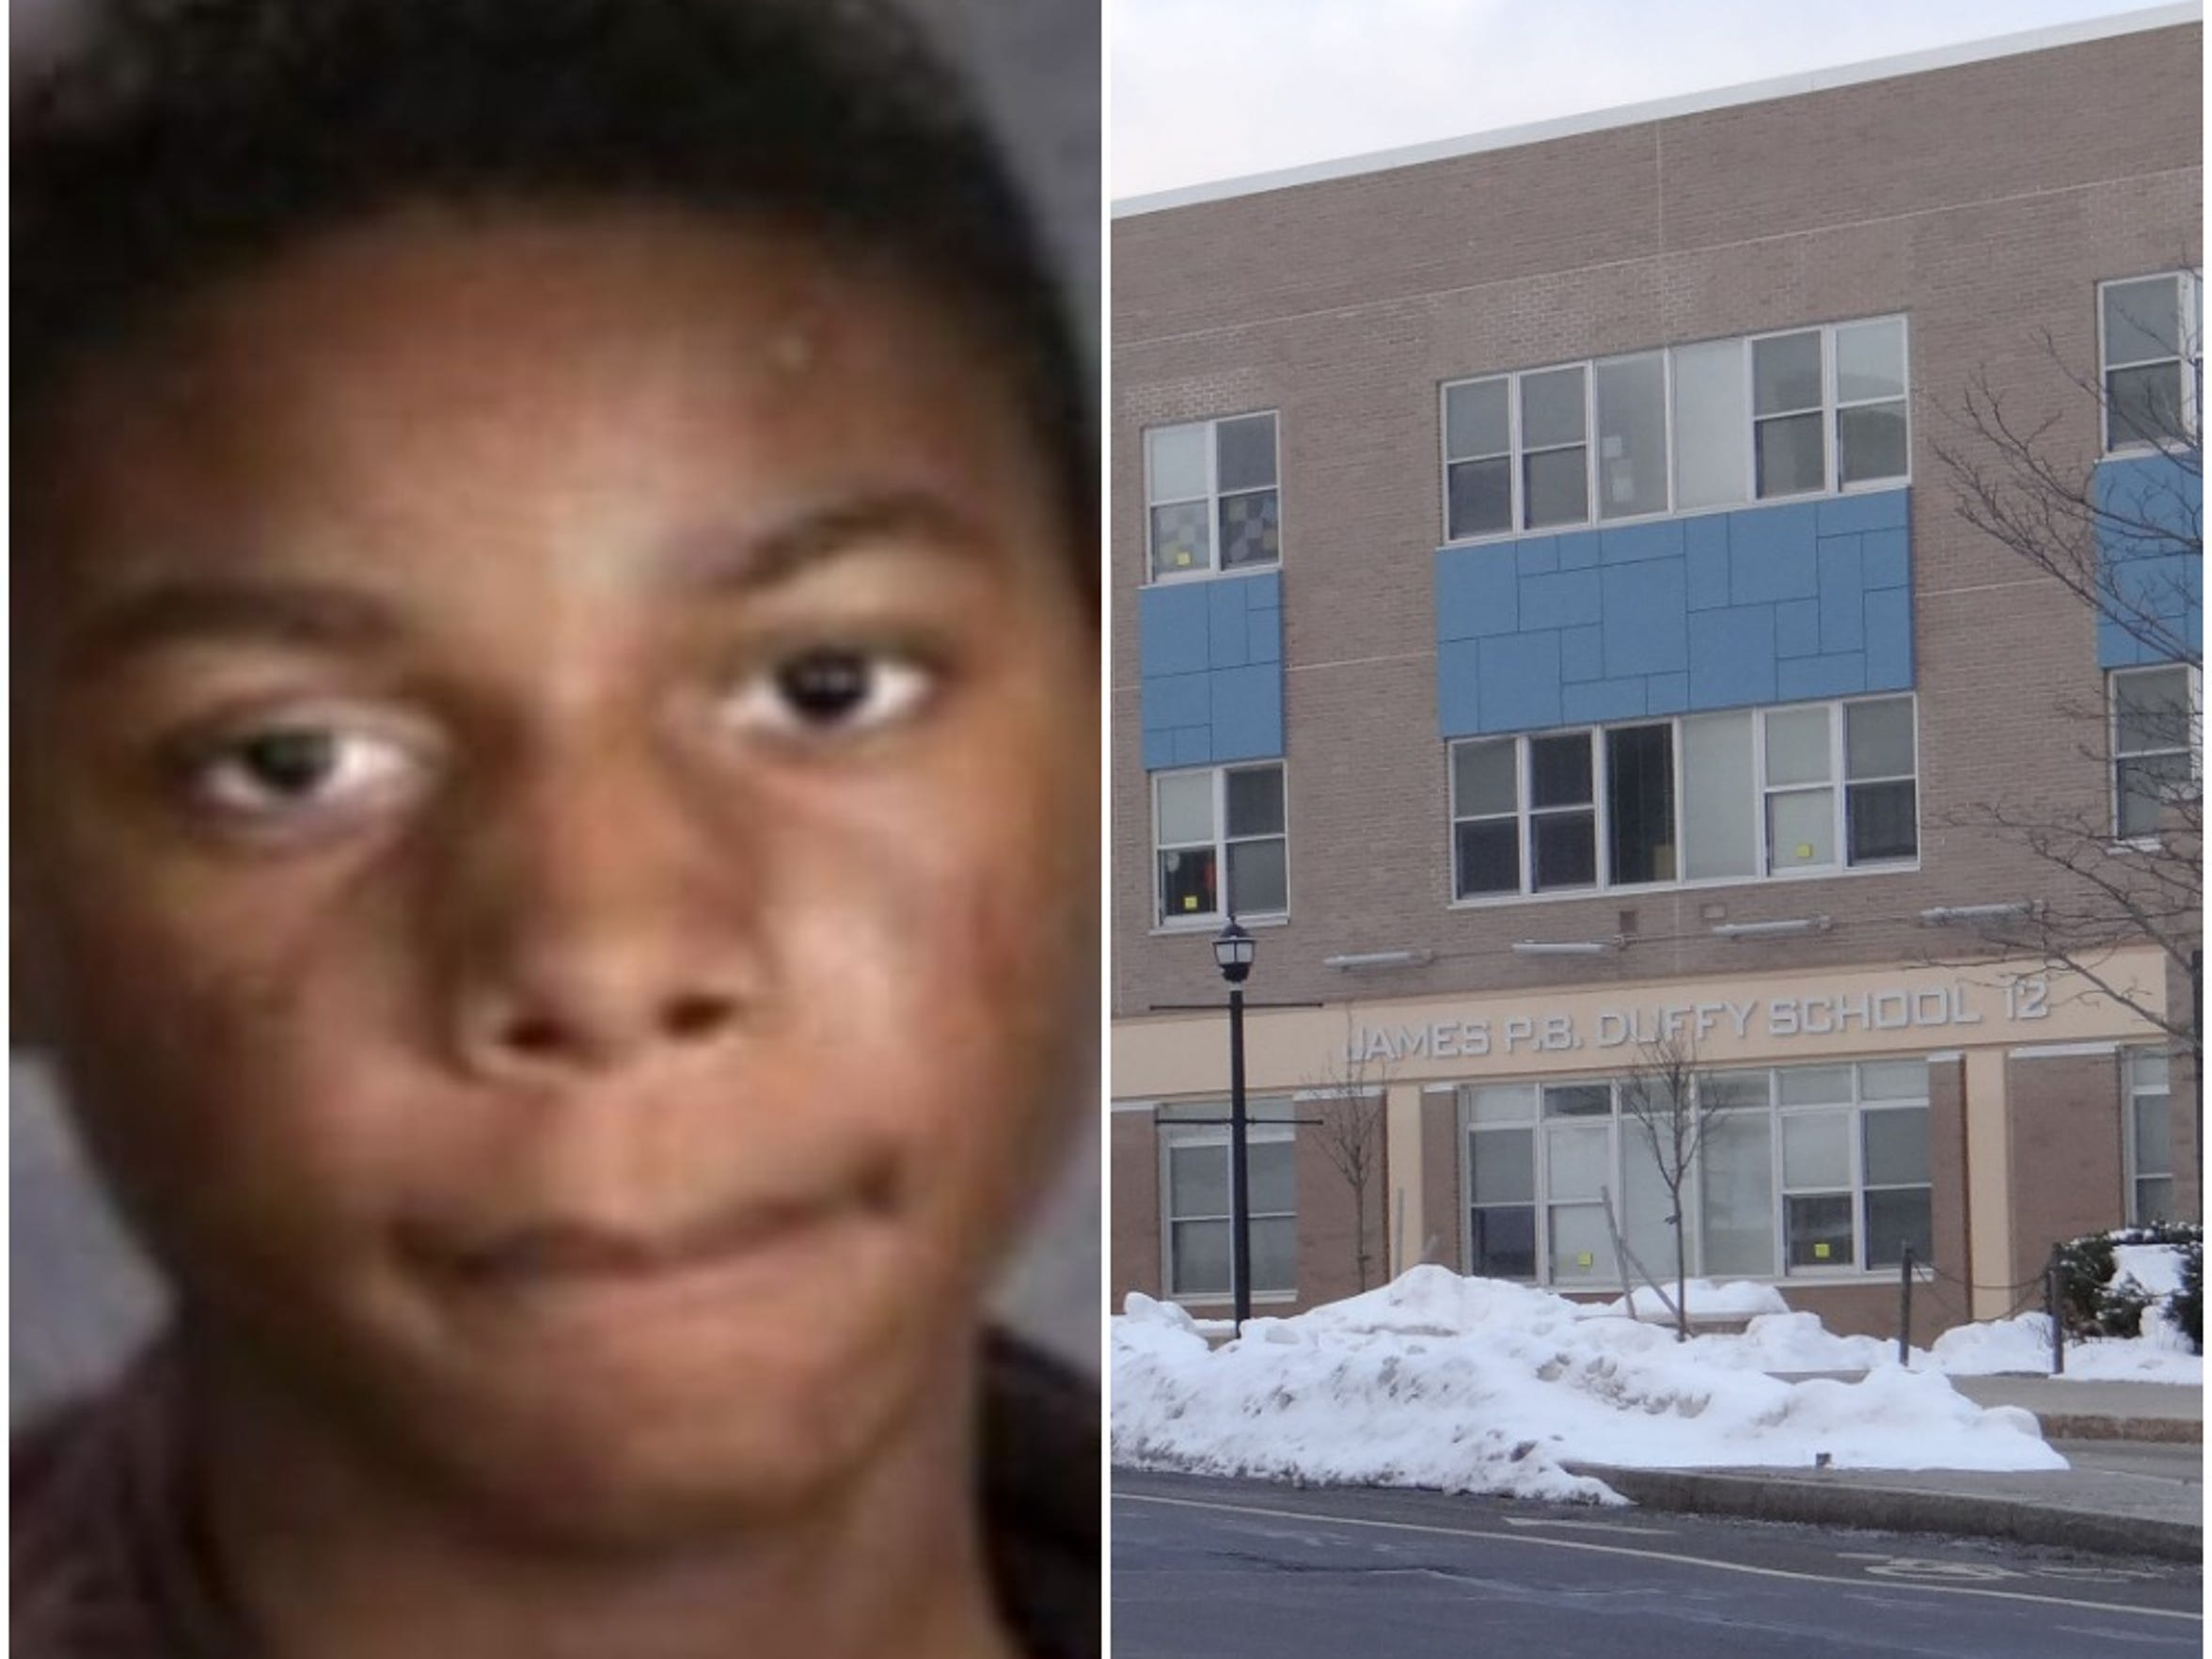 Trevyan Rowe went missing from School 12.